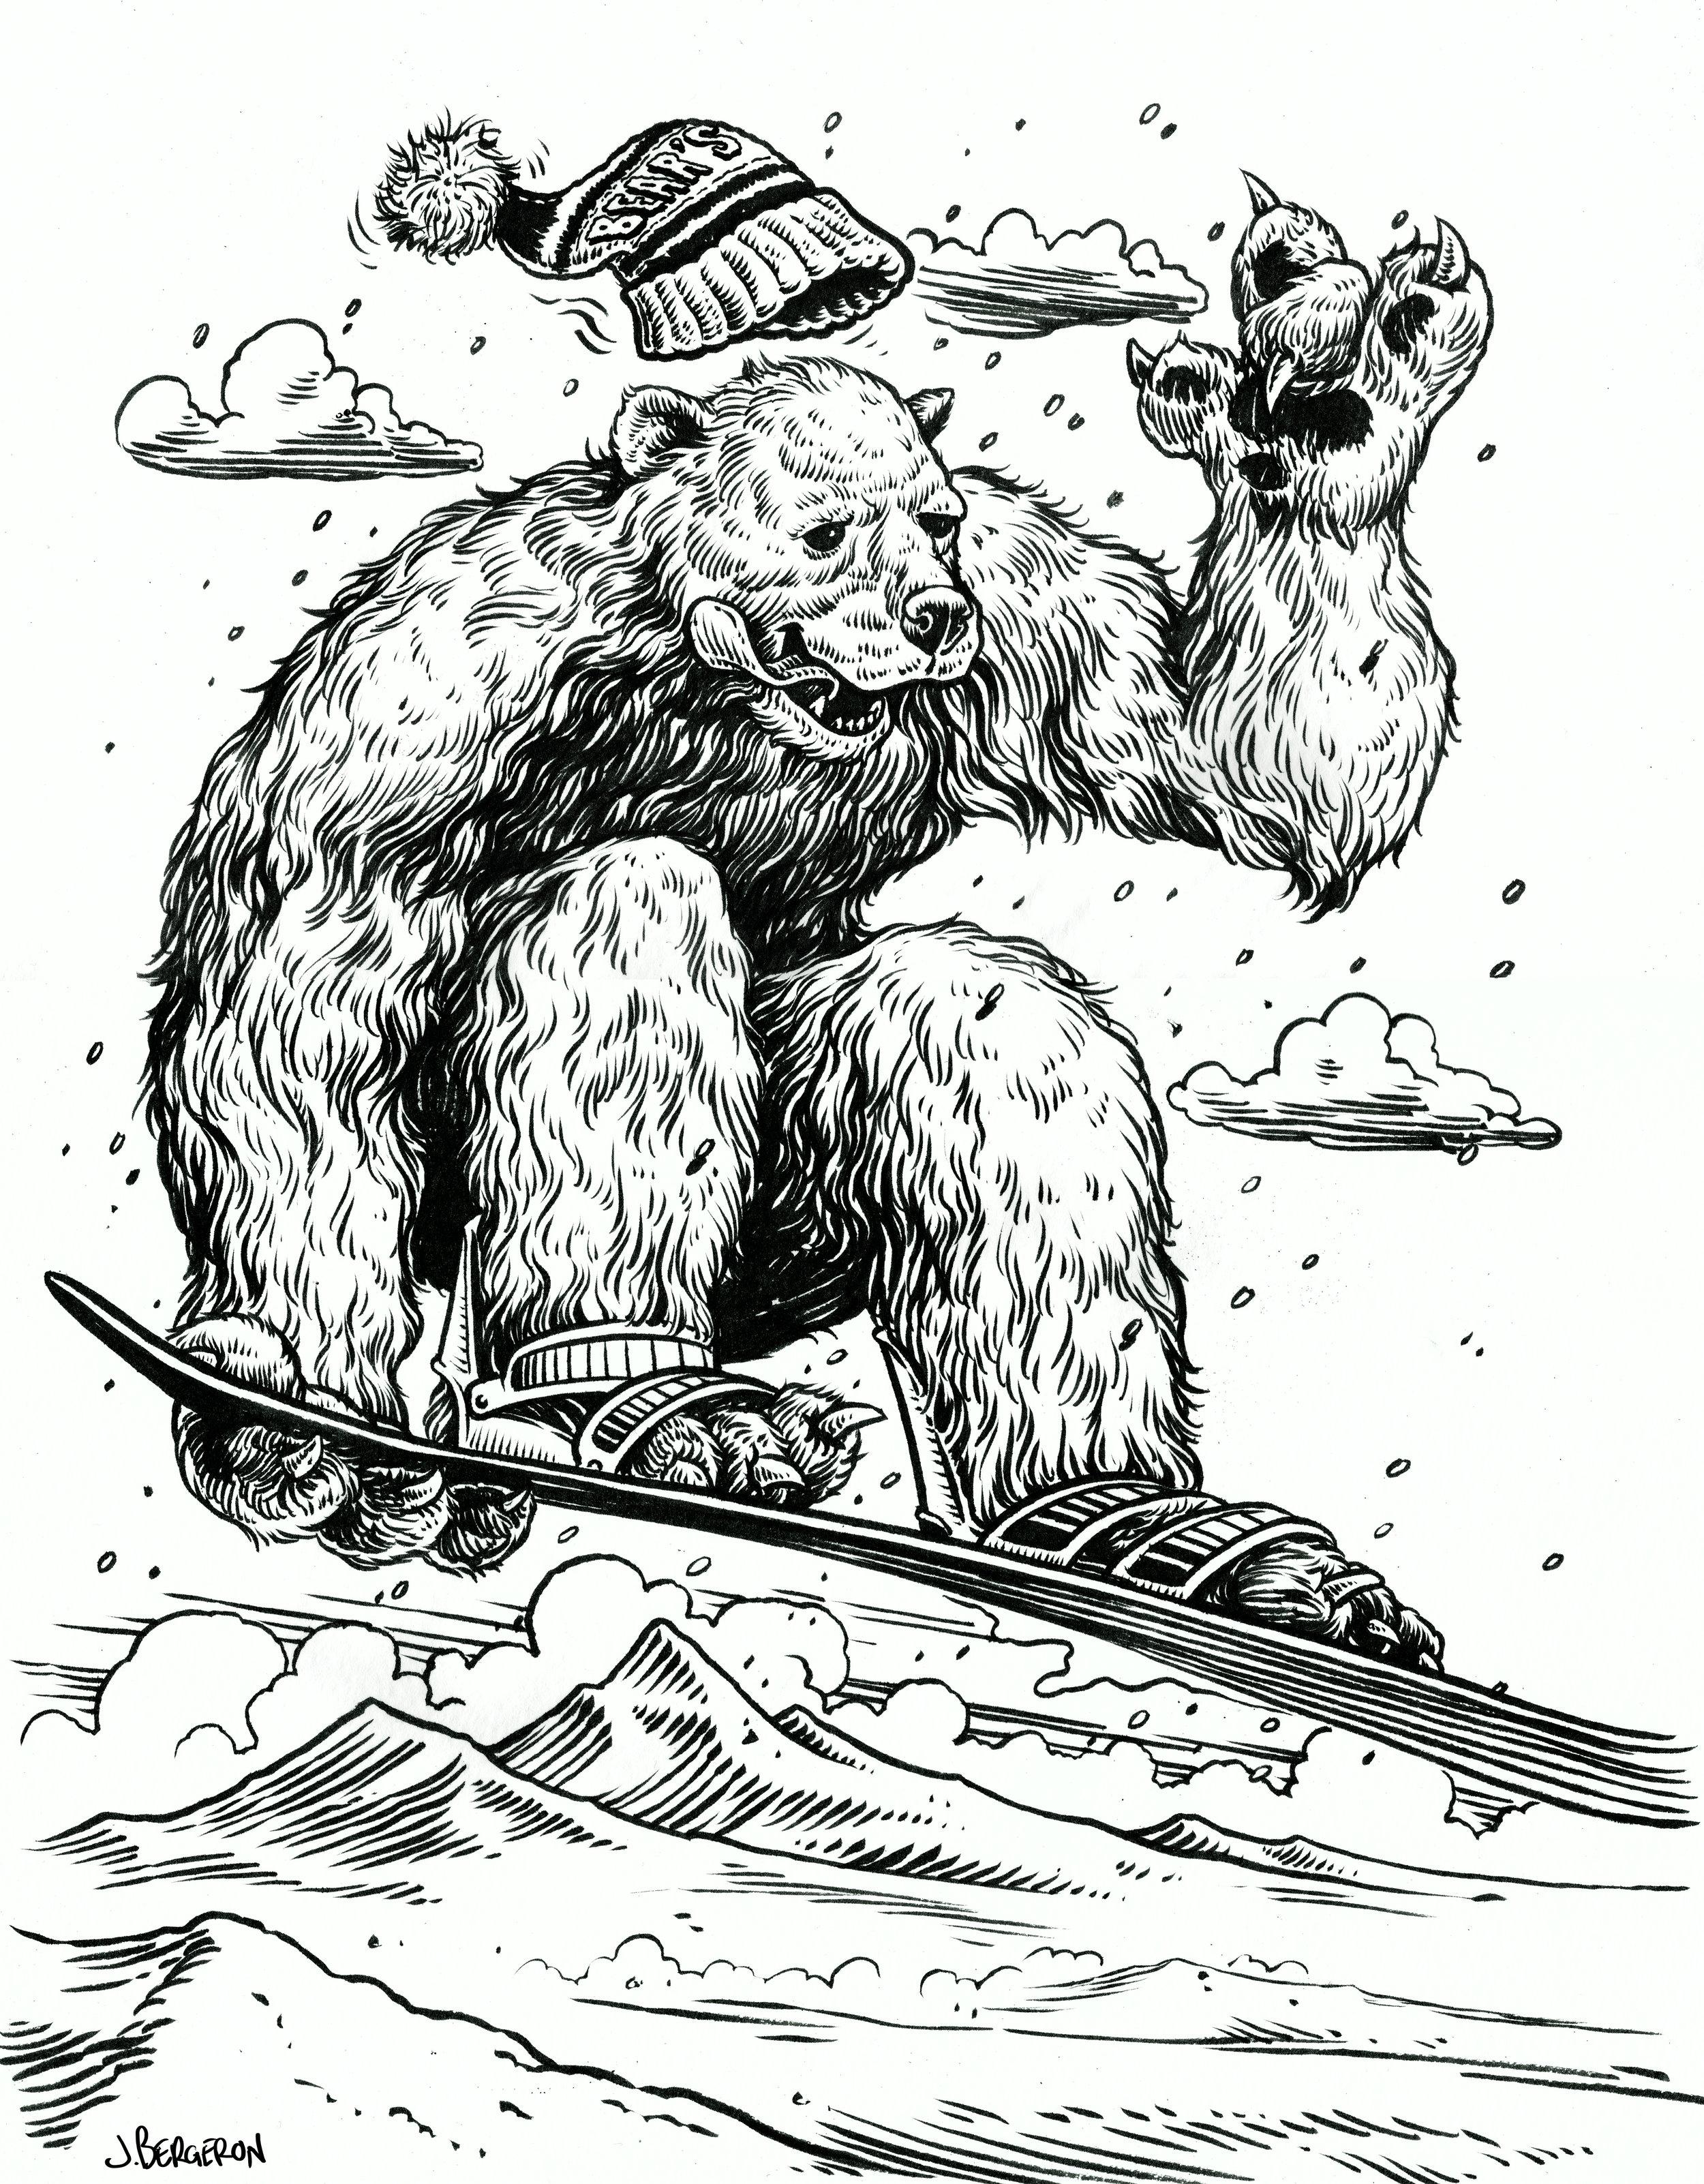 Snowboarding bear (1).jpg